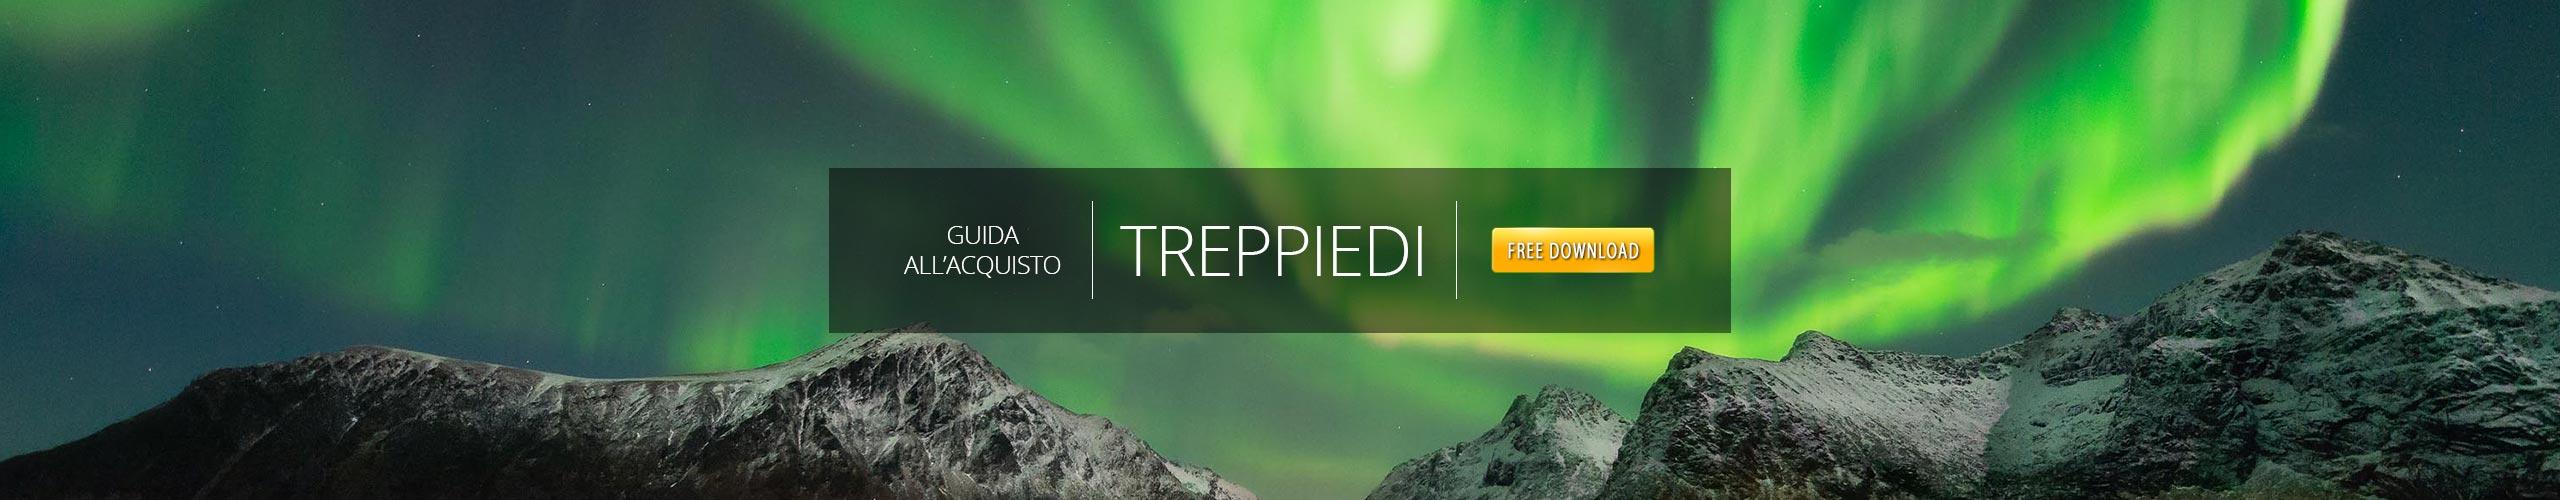 20 12 01 Banner Guida Treppiedi